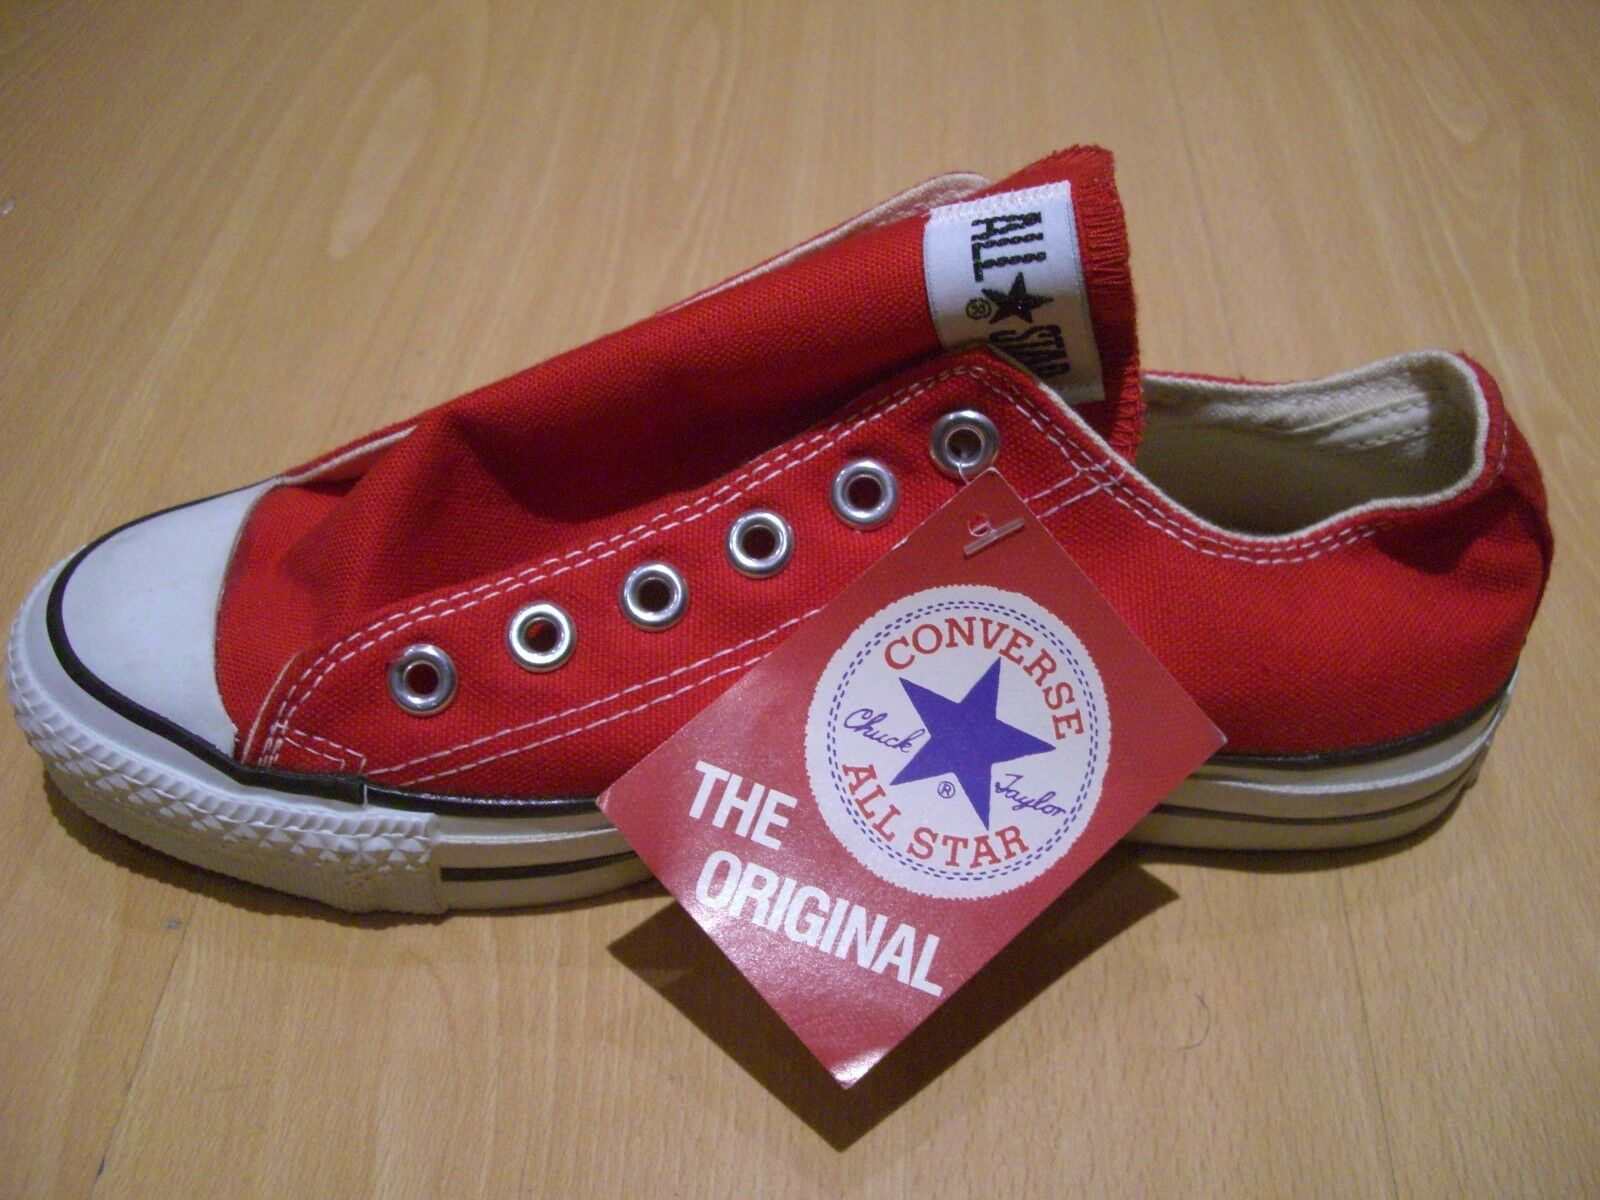 RARE Vintage Classic Nuovo Rosso Converse All Stars USA MADE